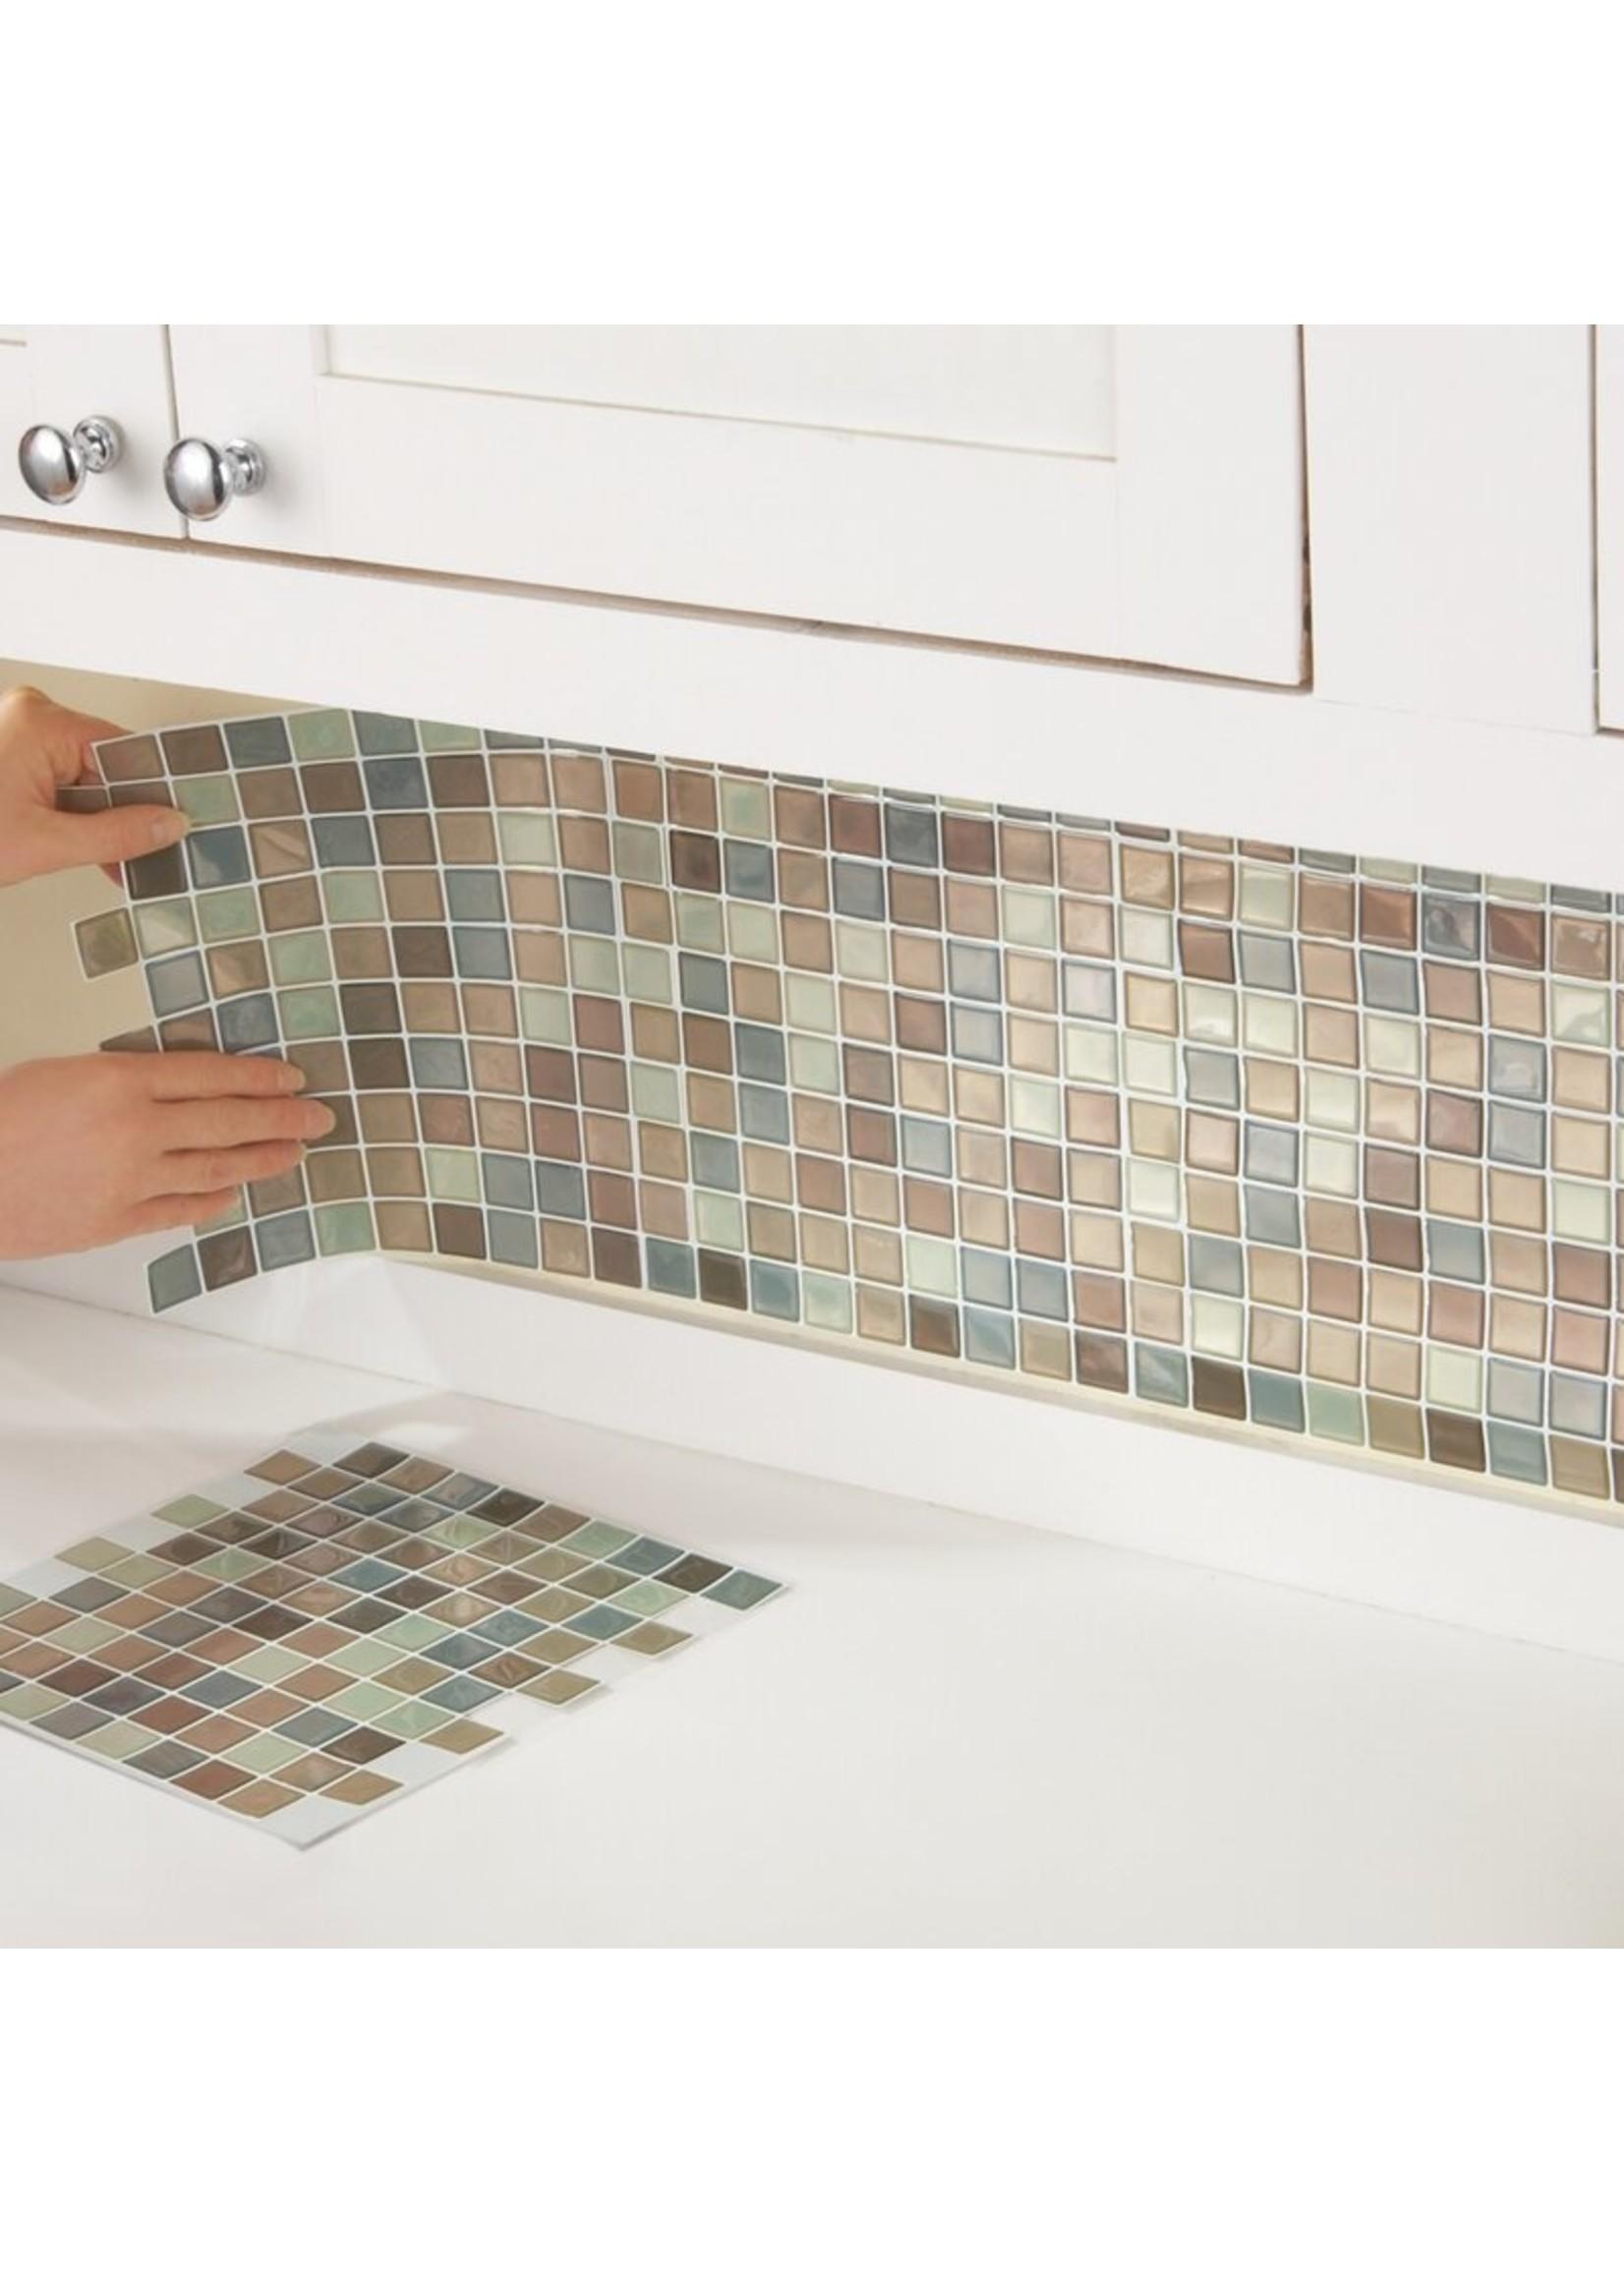 "*10"" x 6"" Gel Peel & Stick Mosaic Tile - Brown/Gray - Set of 6"